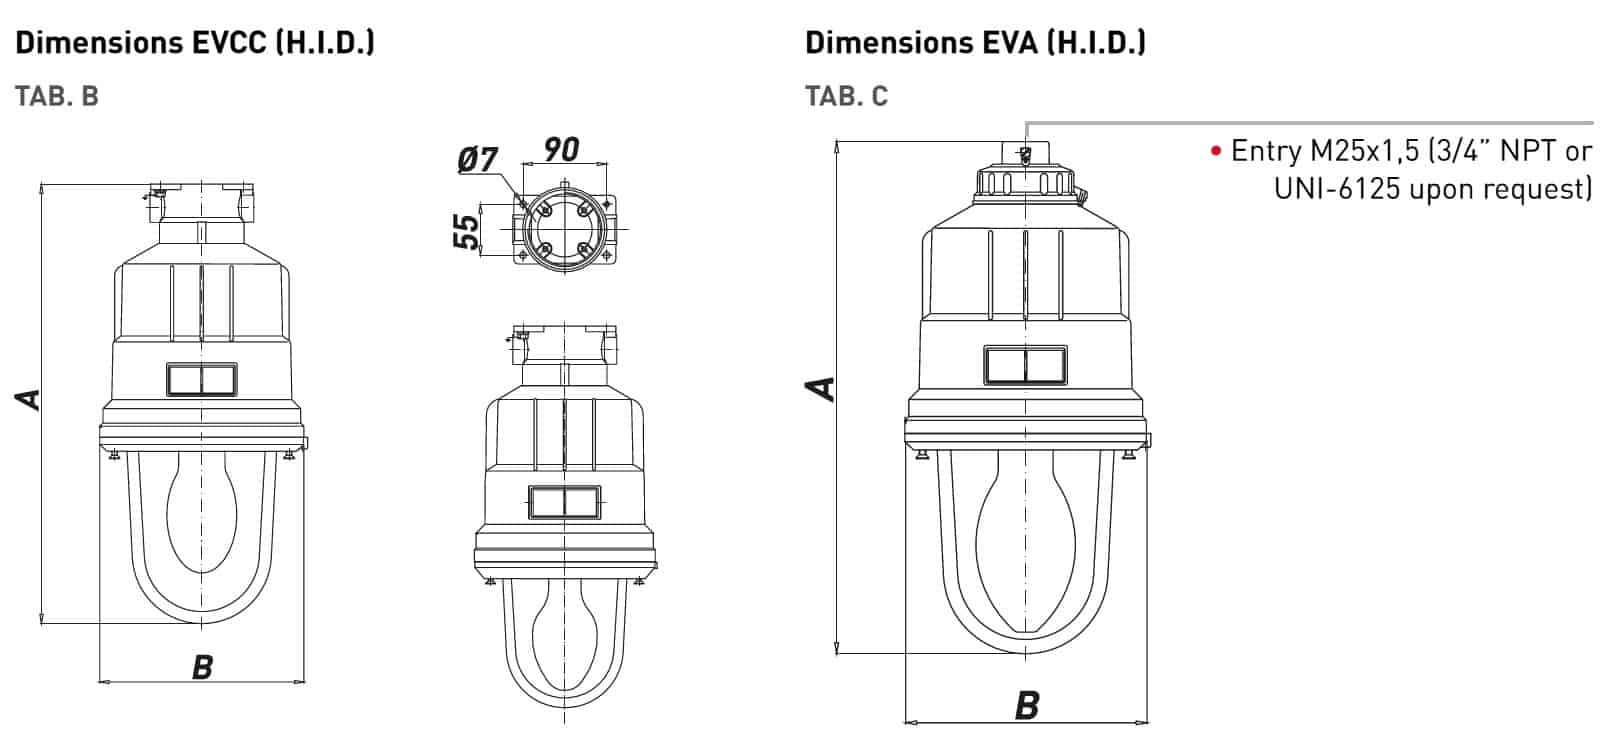 Explosion Proof Hazardous Area Technor EV HID Wellglass Lighting - EVCC & EVA Dimensions